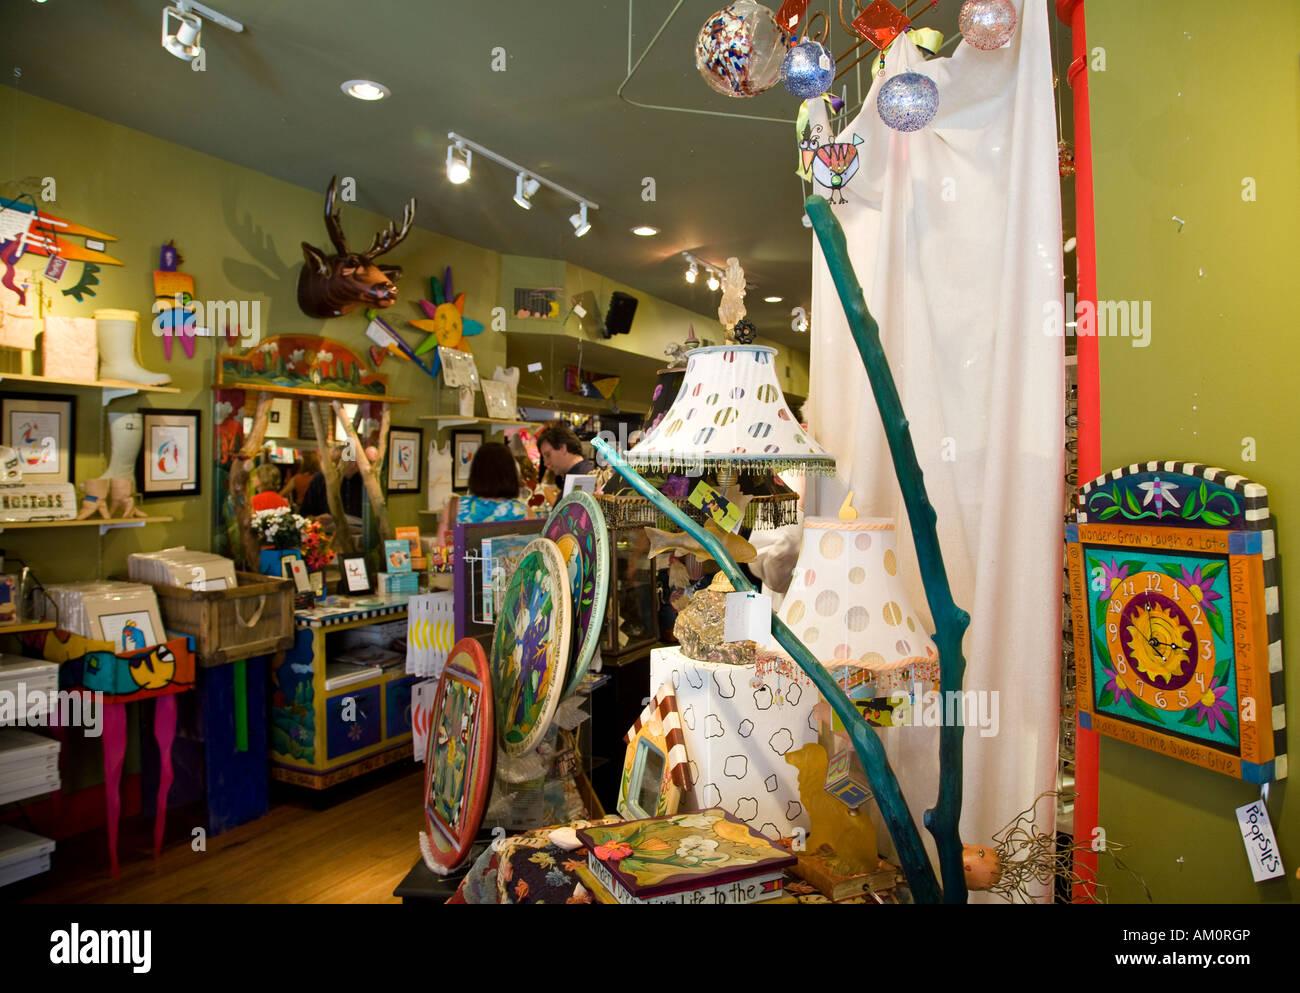 ILLINOIS Galena Items displayed in gift shop interior interior ...